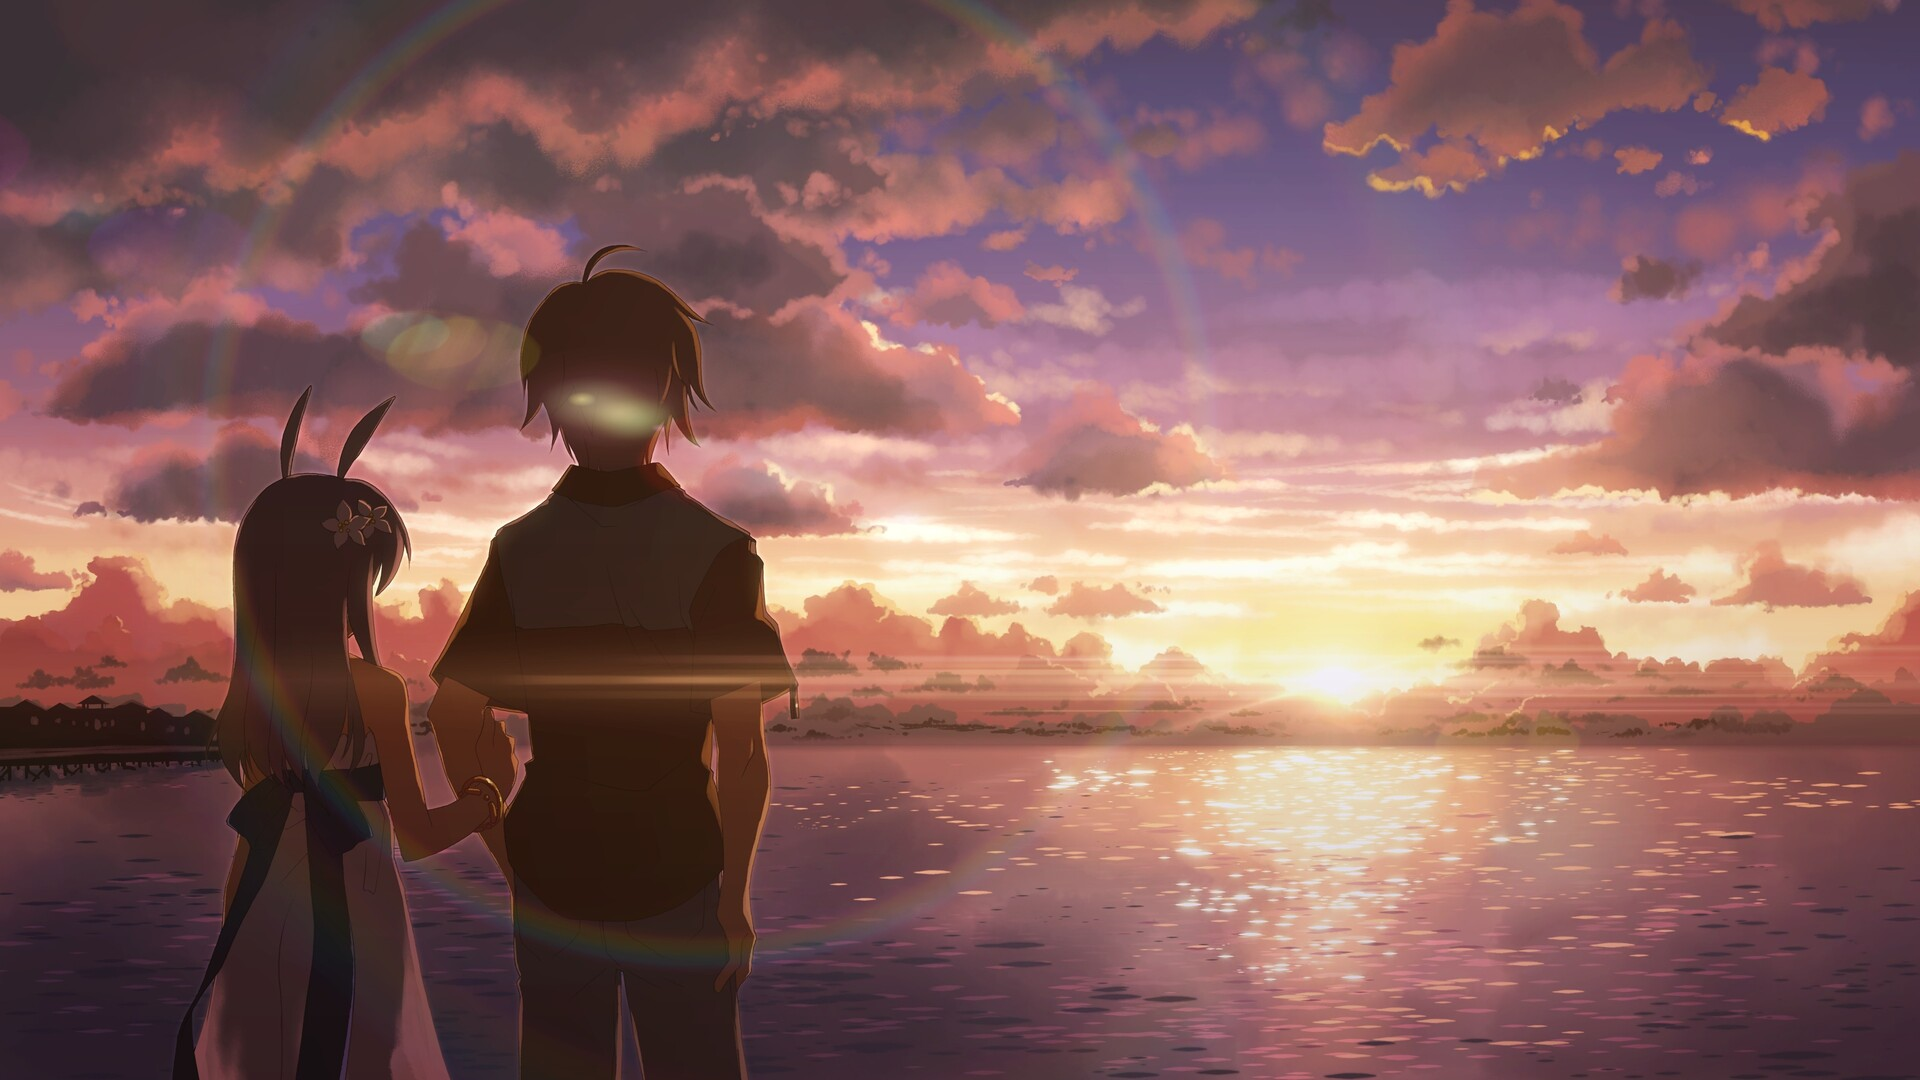 1920x1080 Anime Boy and Girl Alone Laptop Full HD 1080P HD ...